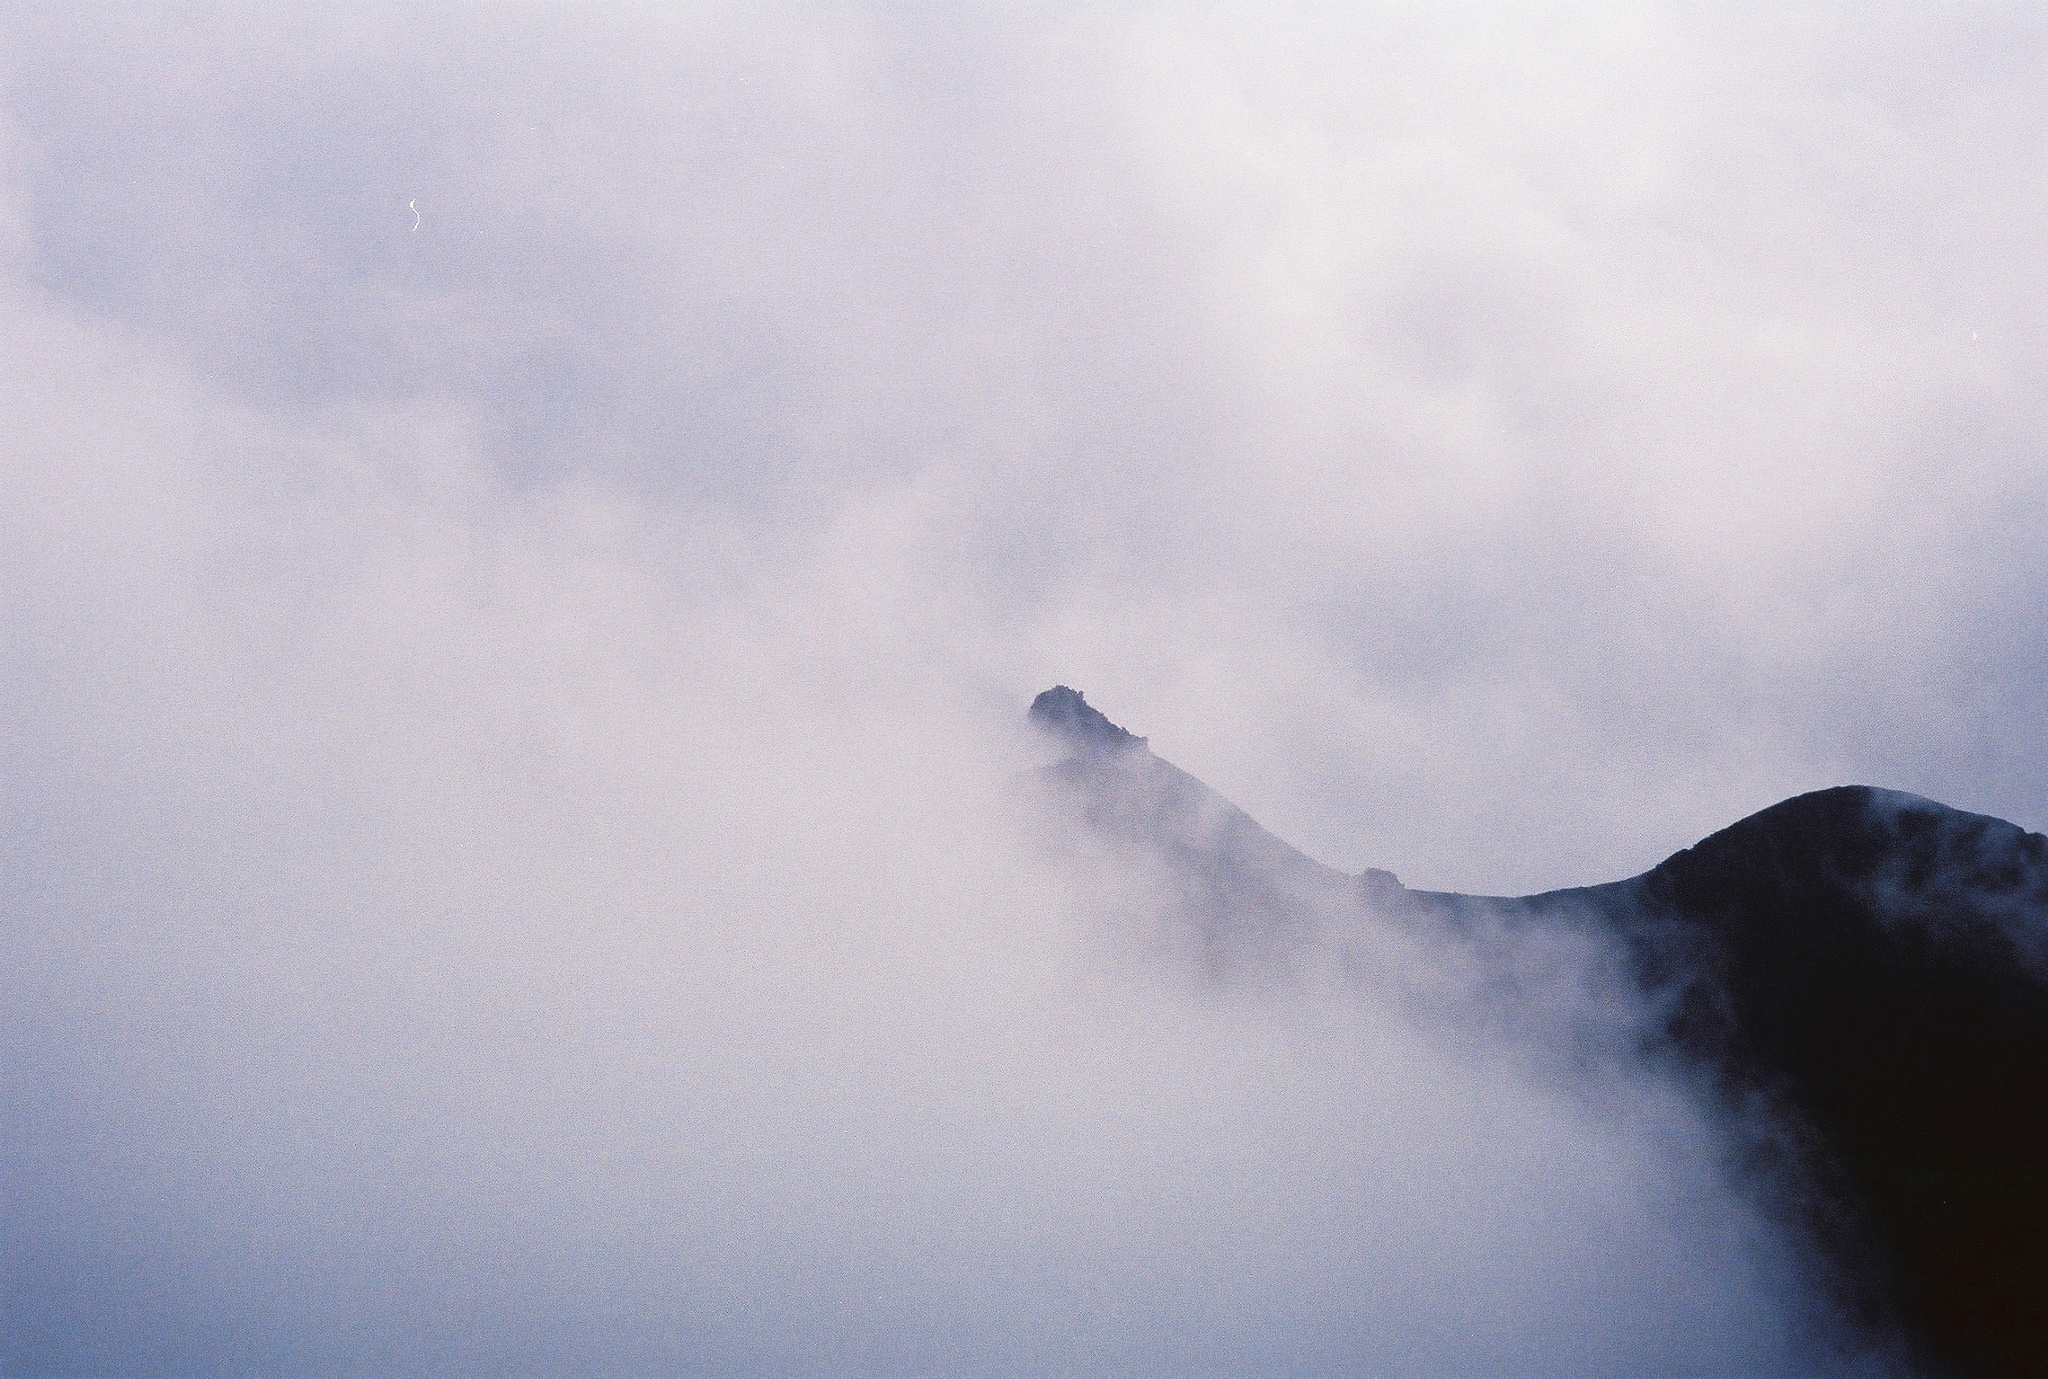 Mountain by meguriya0